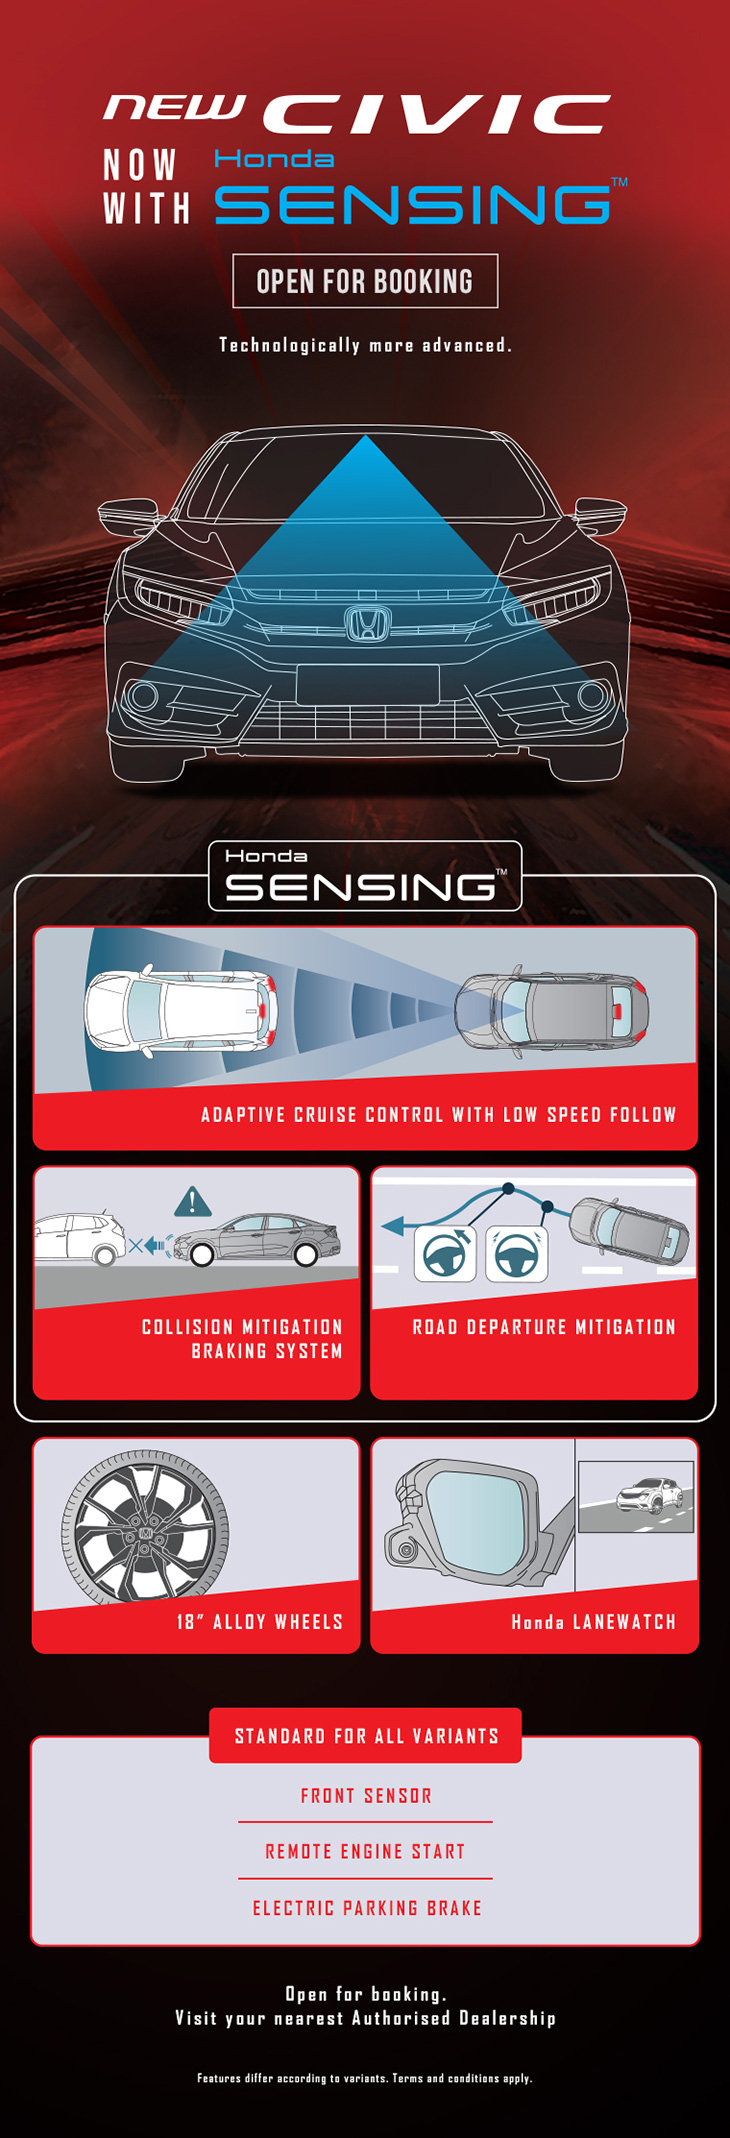 Honda Civic_Sensing.jpg